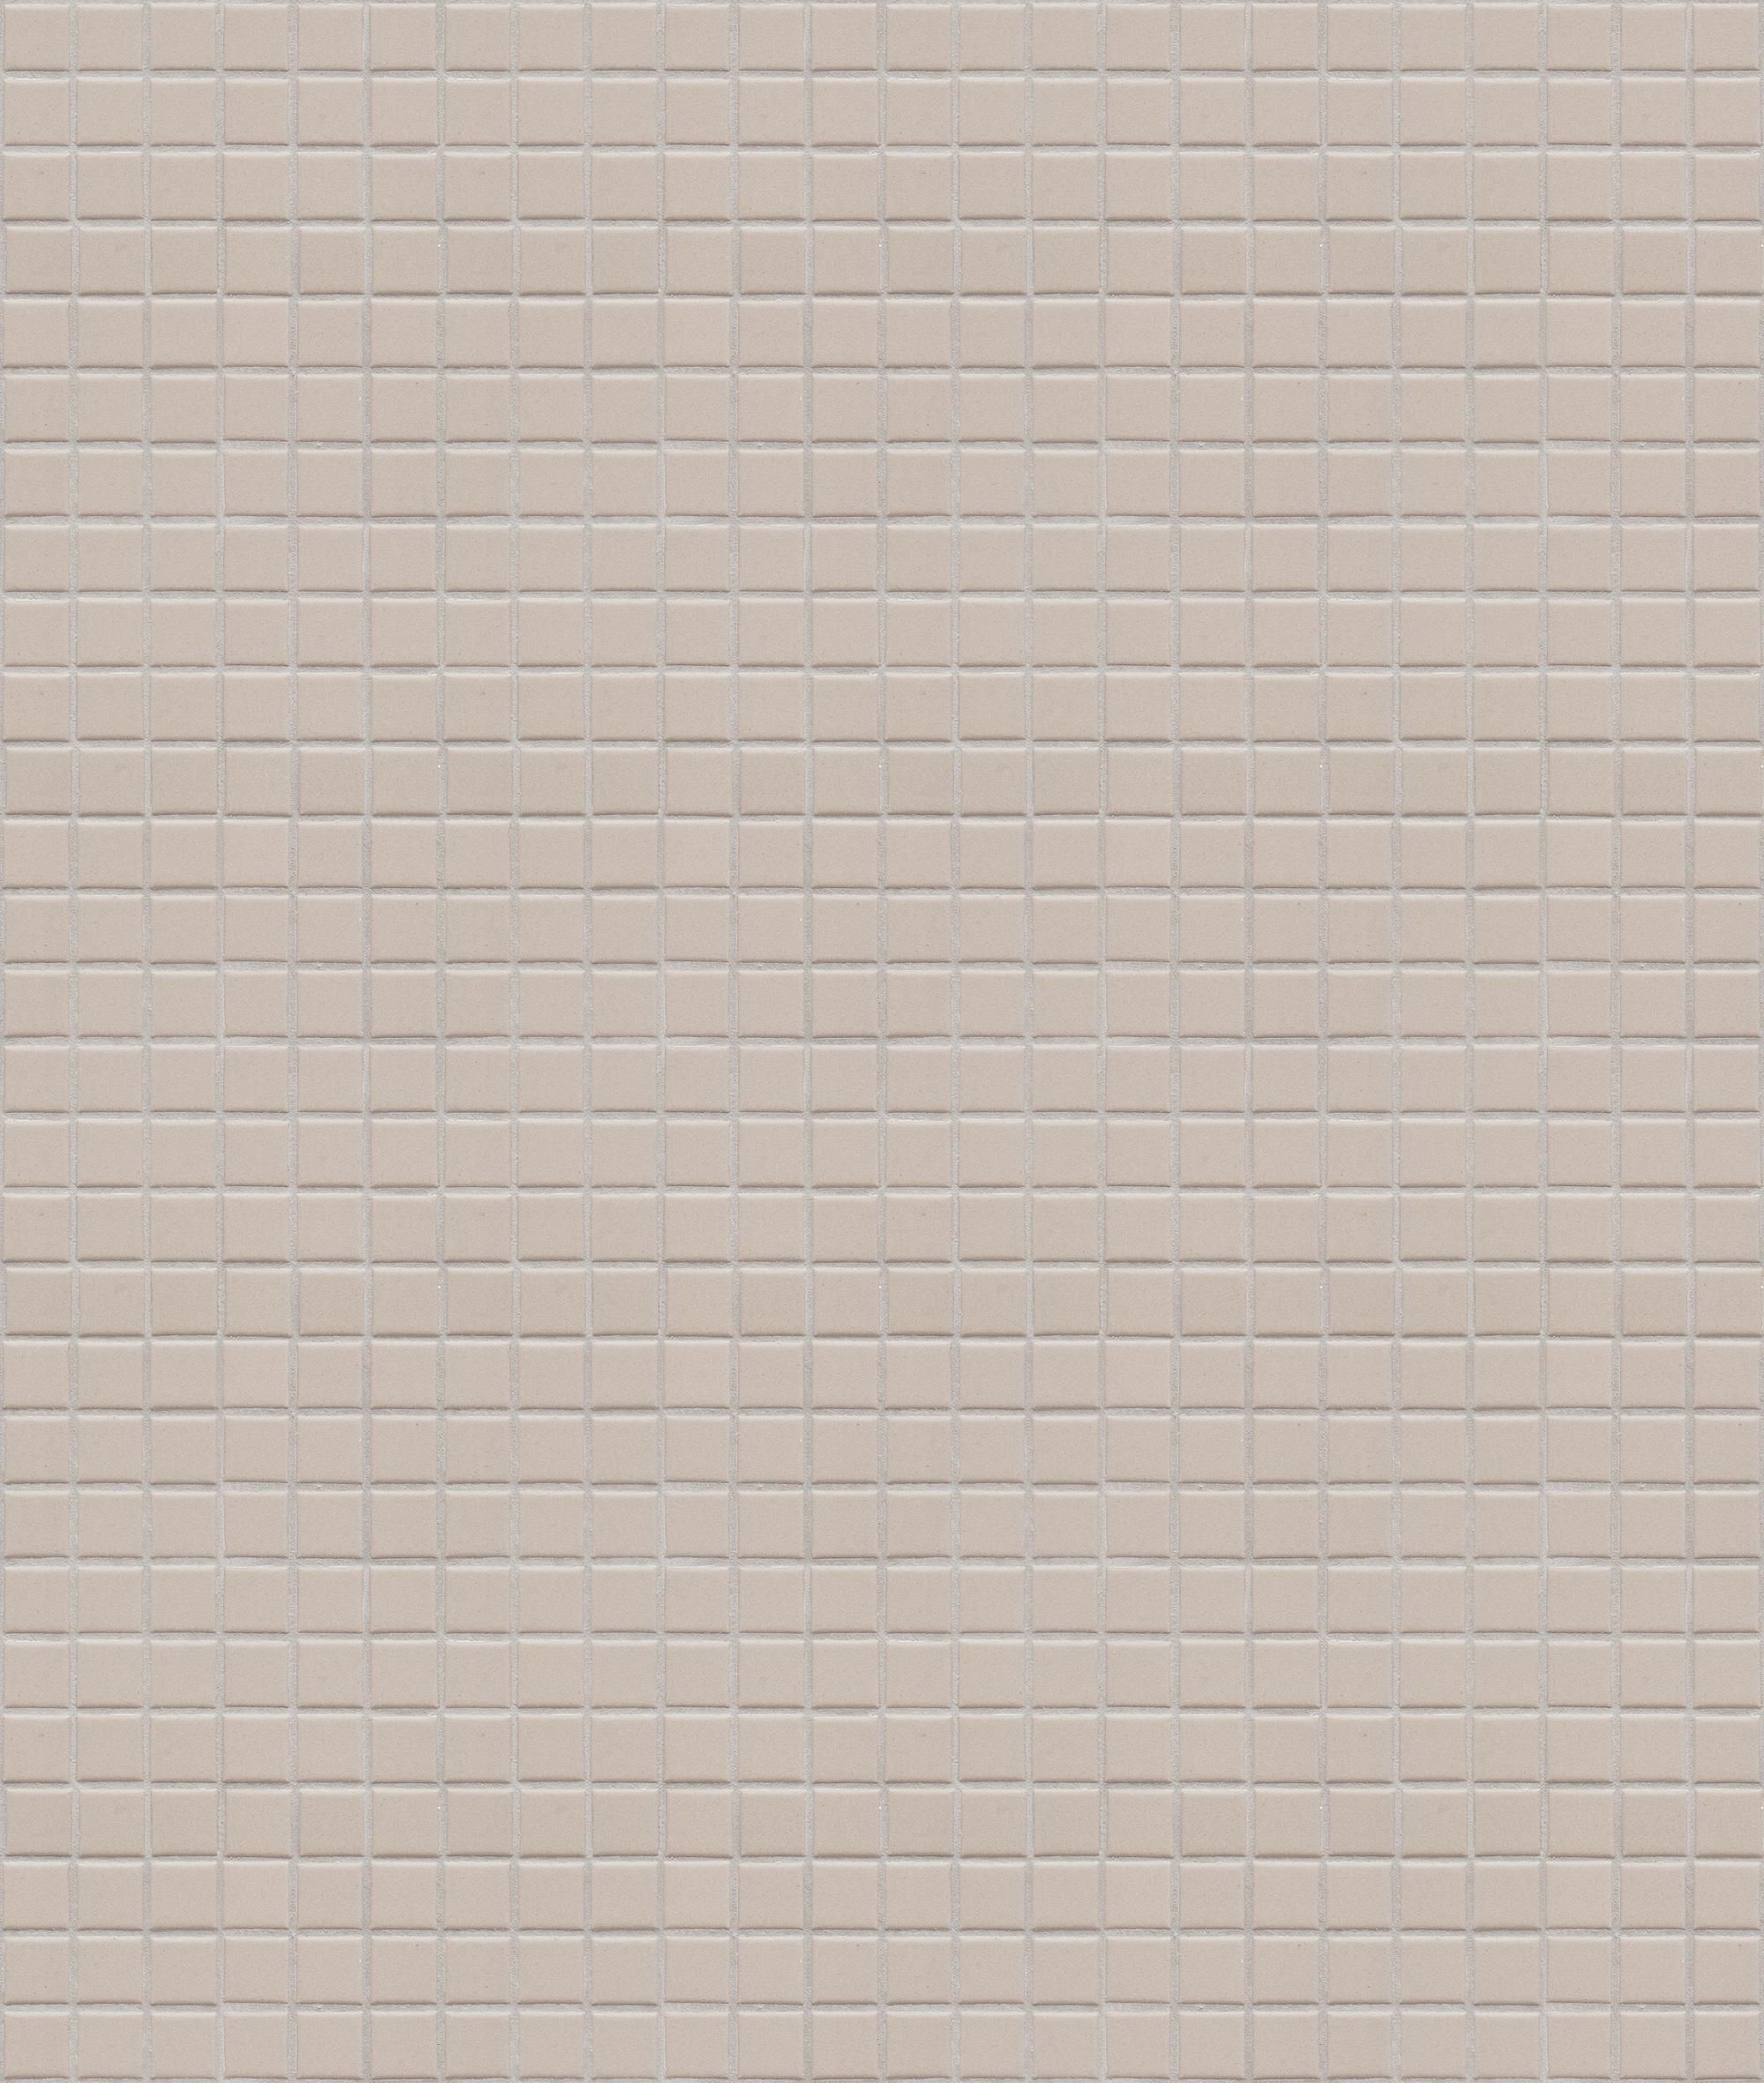 204206347 also A 132027 also Walk In Closet Window Seat besides Sikaflex 11fc moreover Textured Tiles. on beige walls